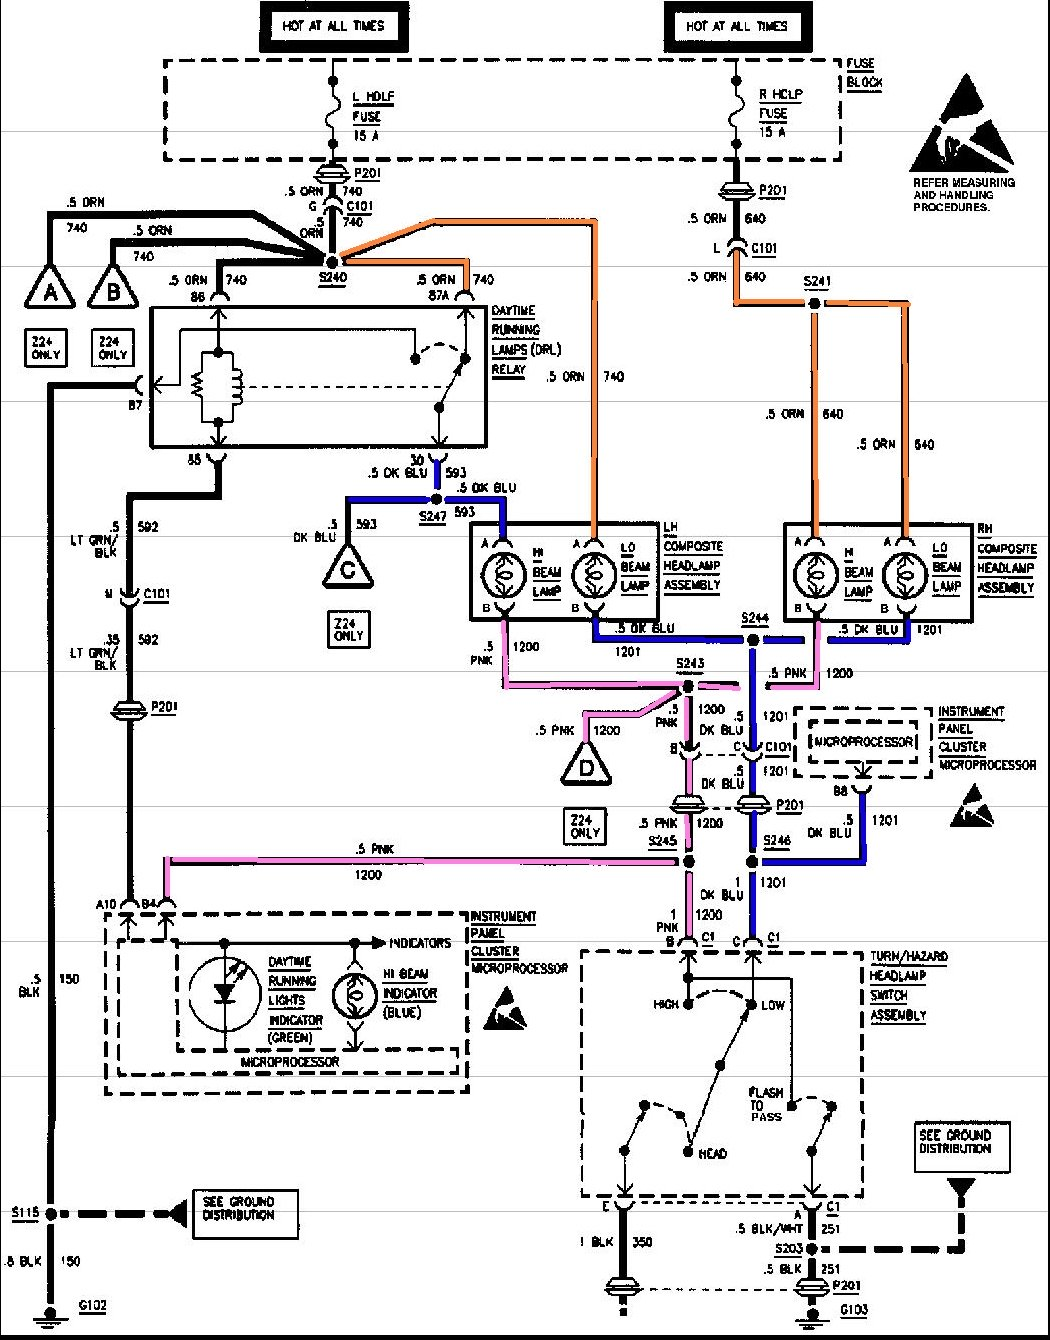 1999 Chevy Cavalier Headlight Wiring Diagram Wiring Diagram Provider Provider Frankmotors Es